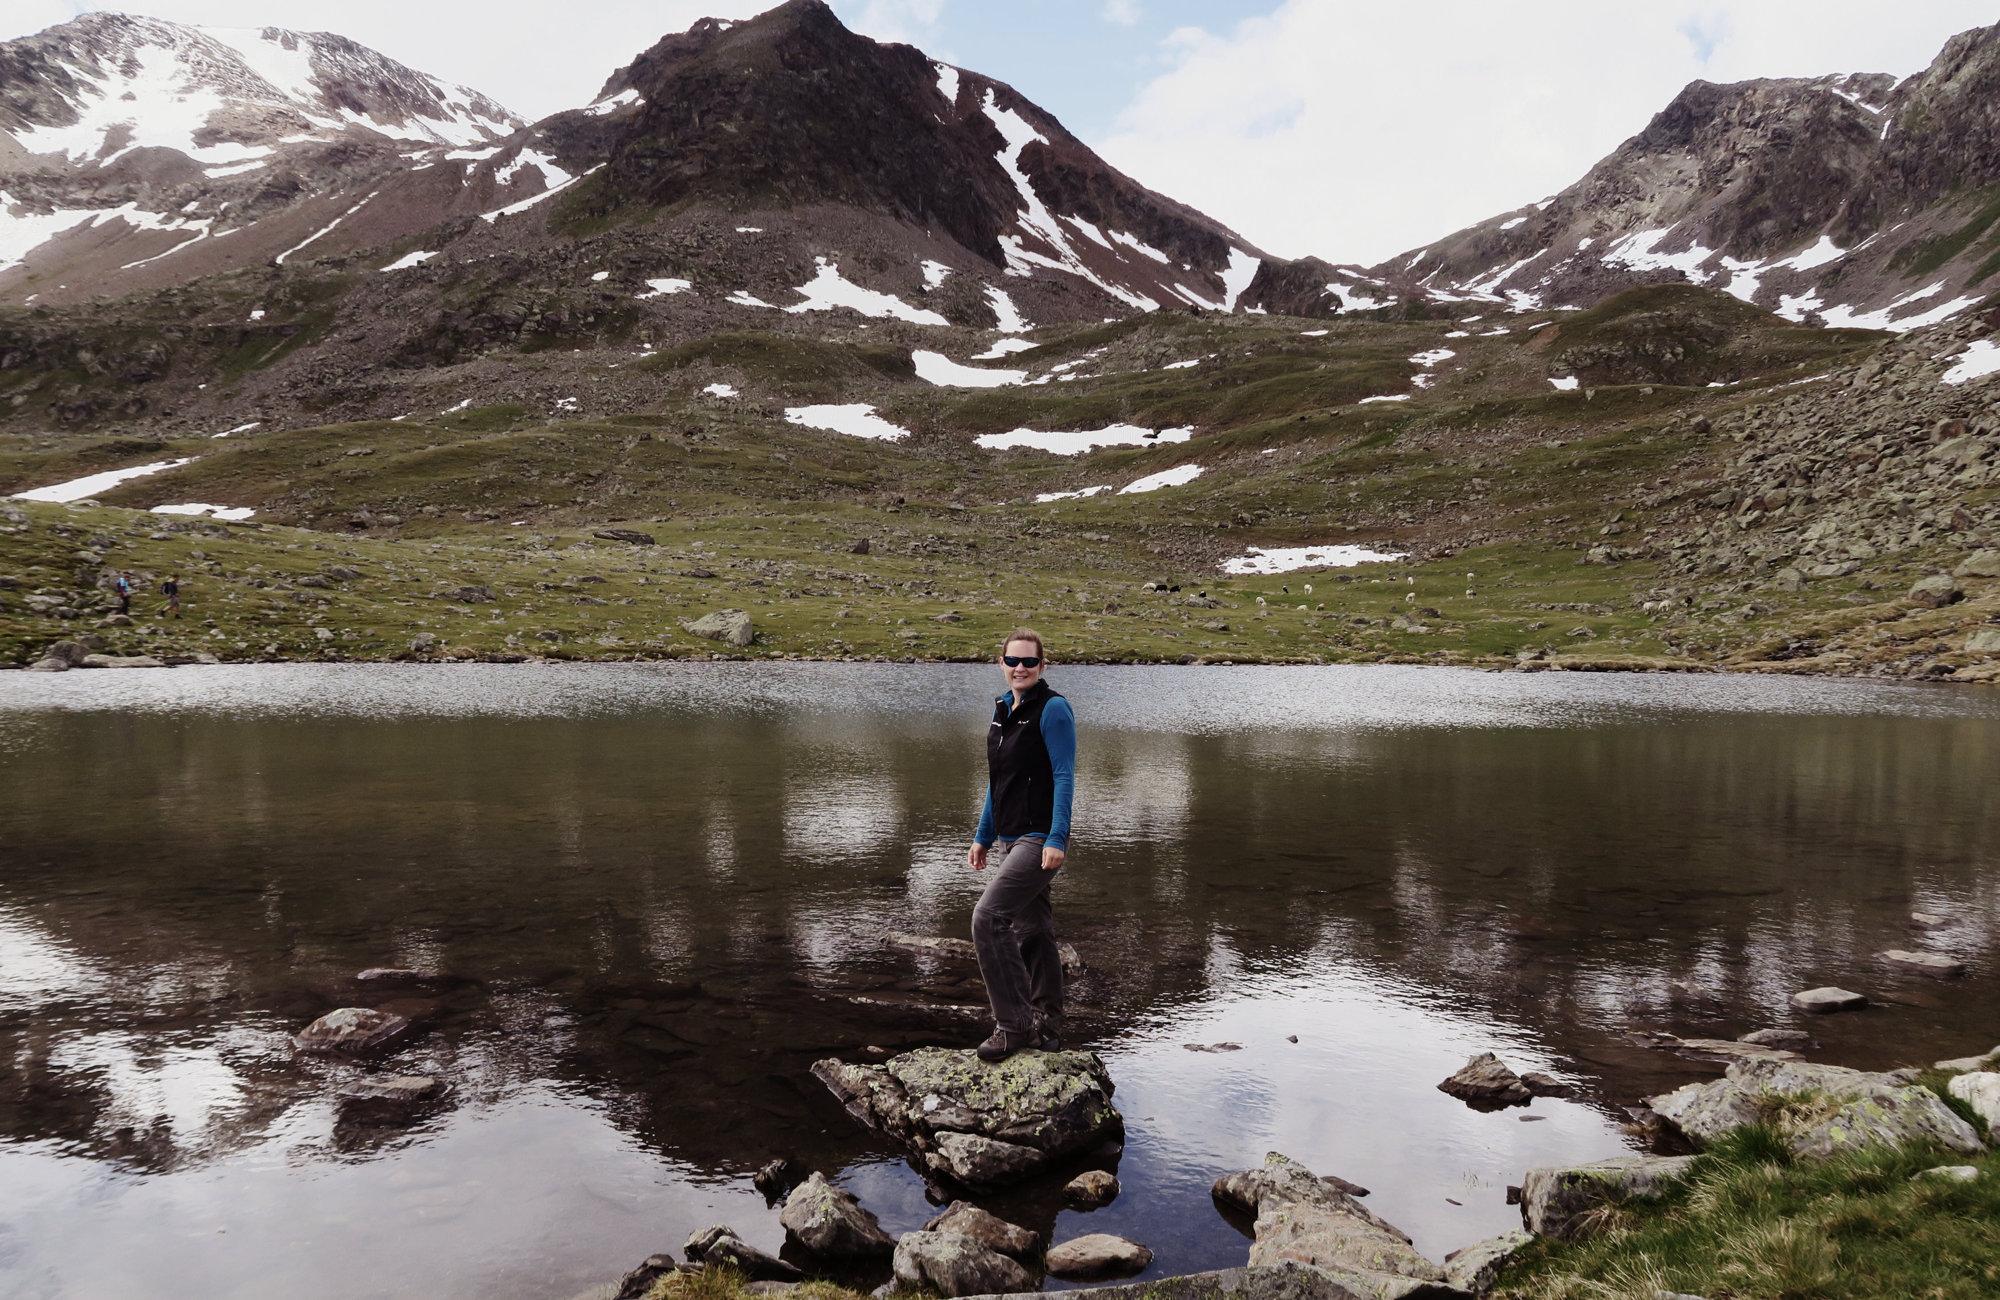 Am Sohmsee, Wandertour Seenplatte, Wandern im Ötztal, Wandertour Ötztal, Ötztaler Alpen, Bergwandern, Tirol